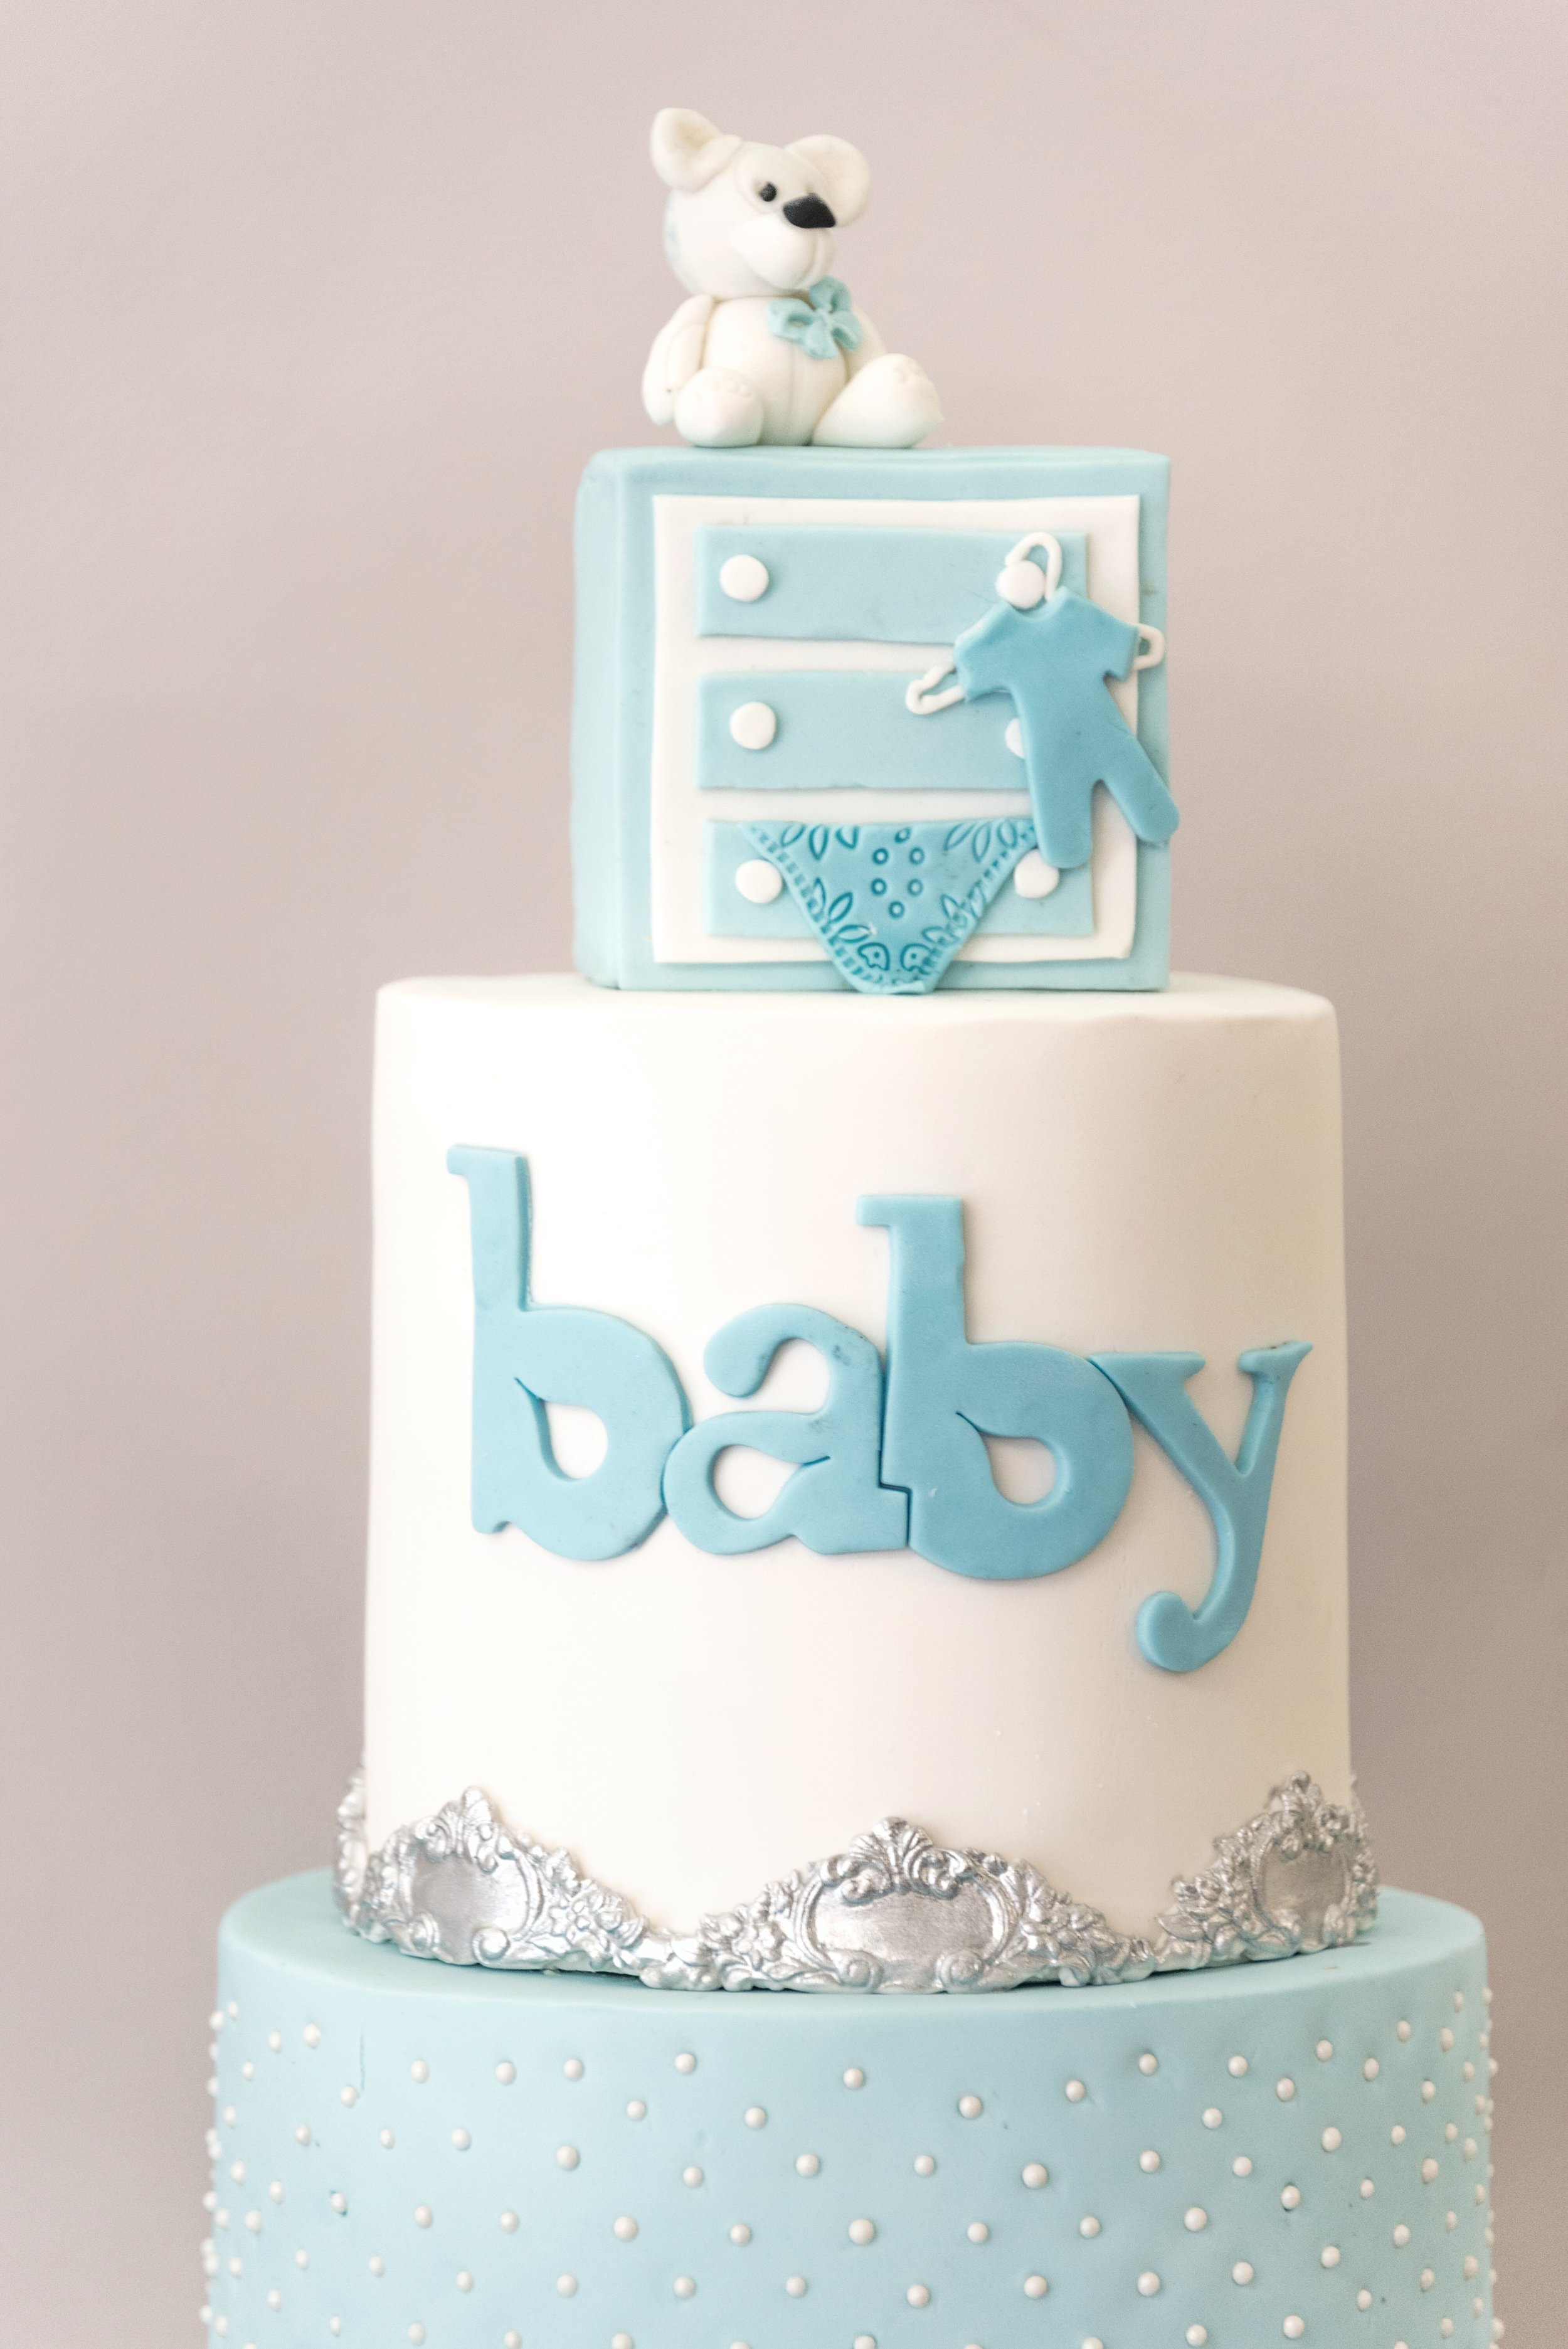 Baby Shower Cake Teddy Bear and Dresser.jpg